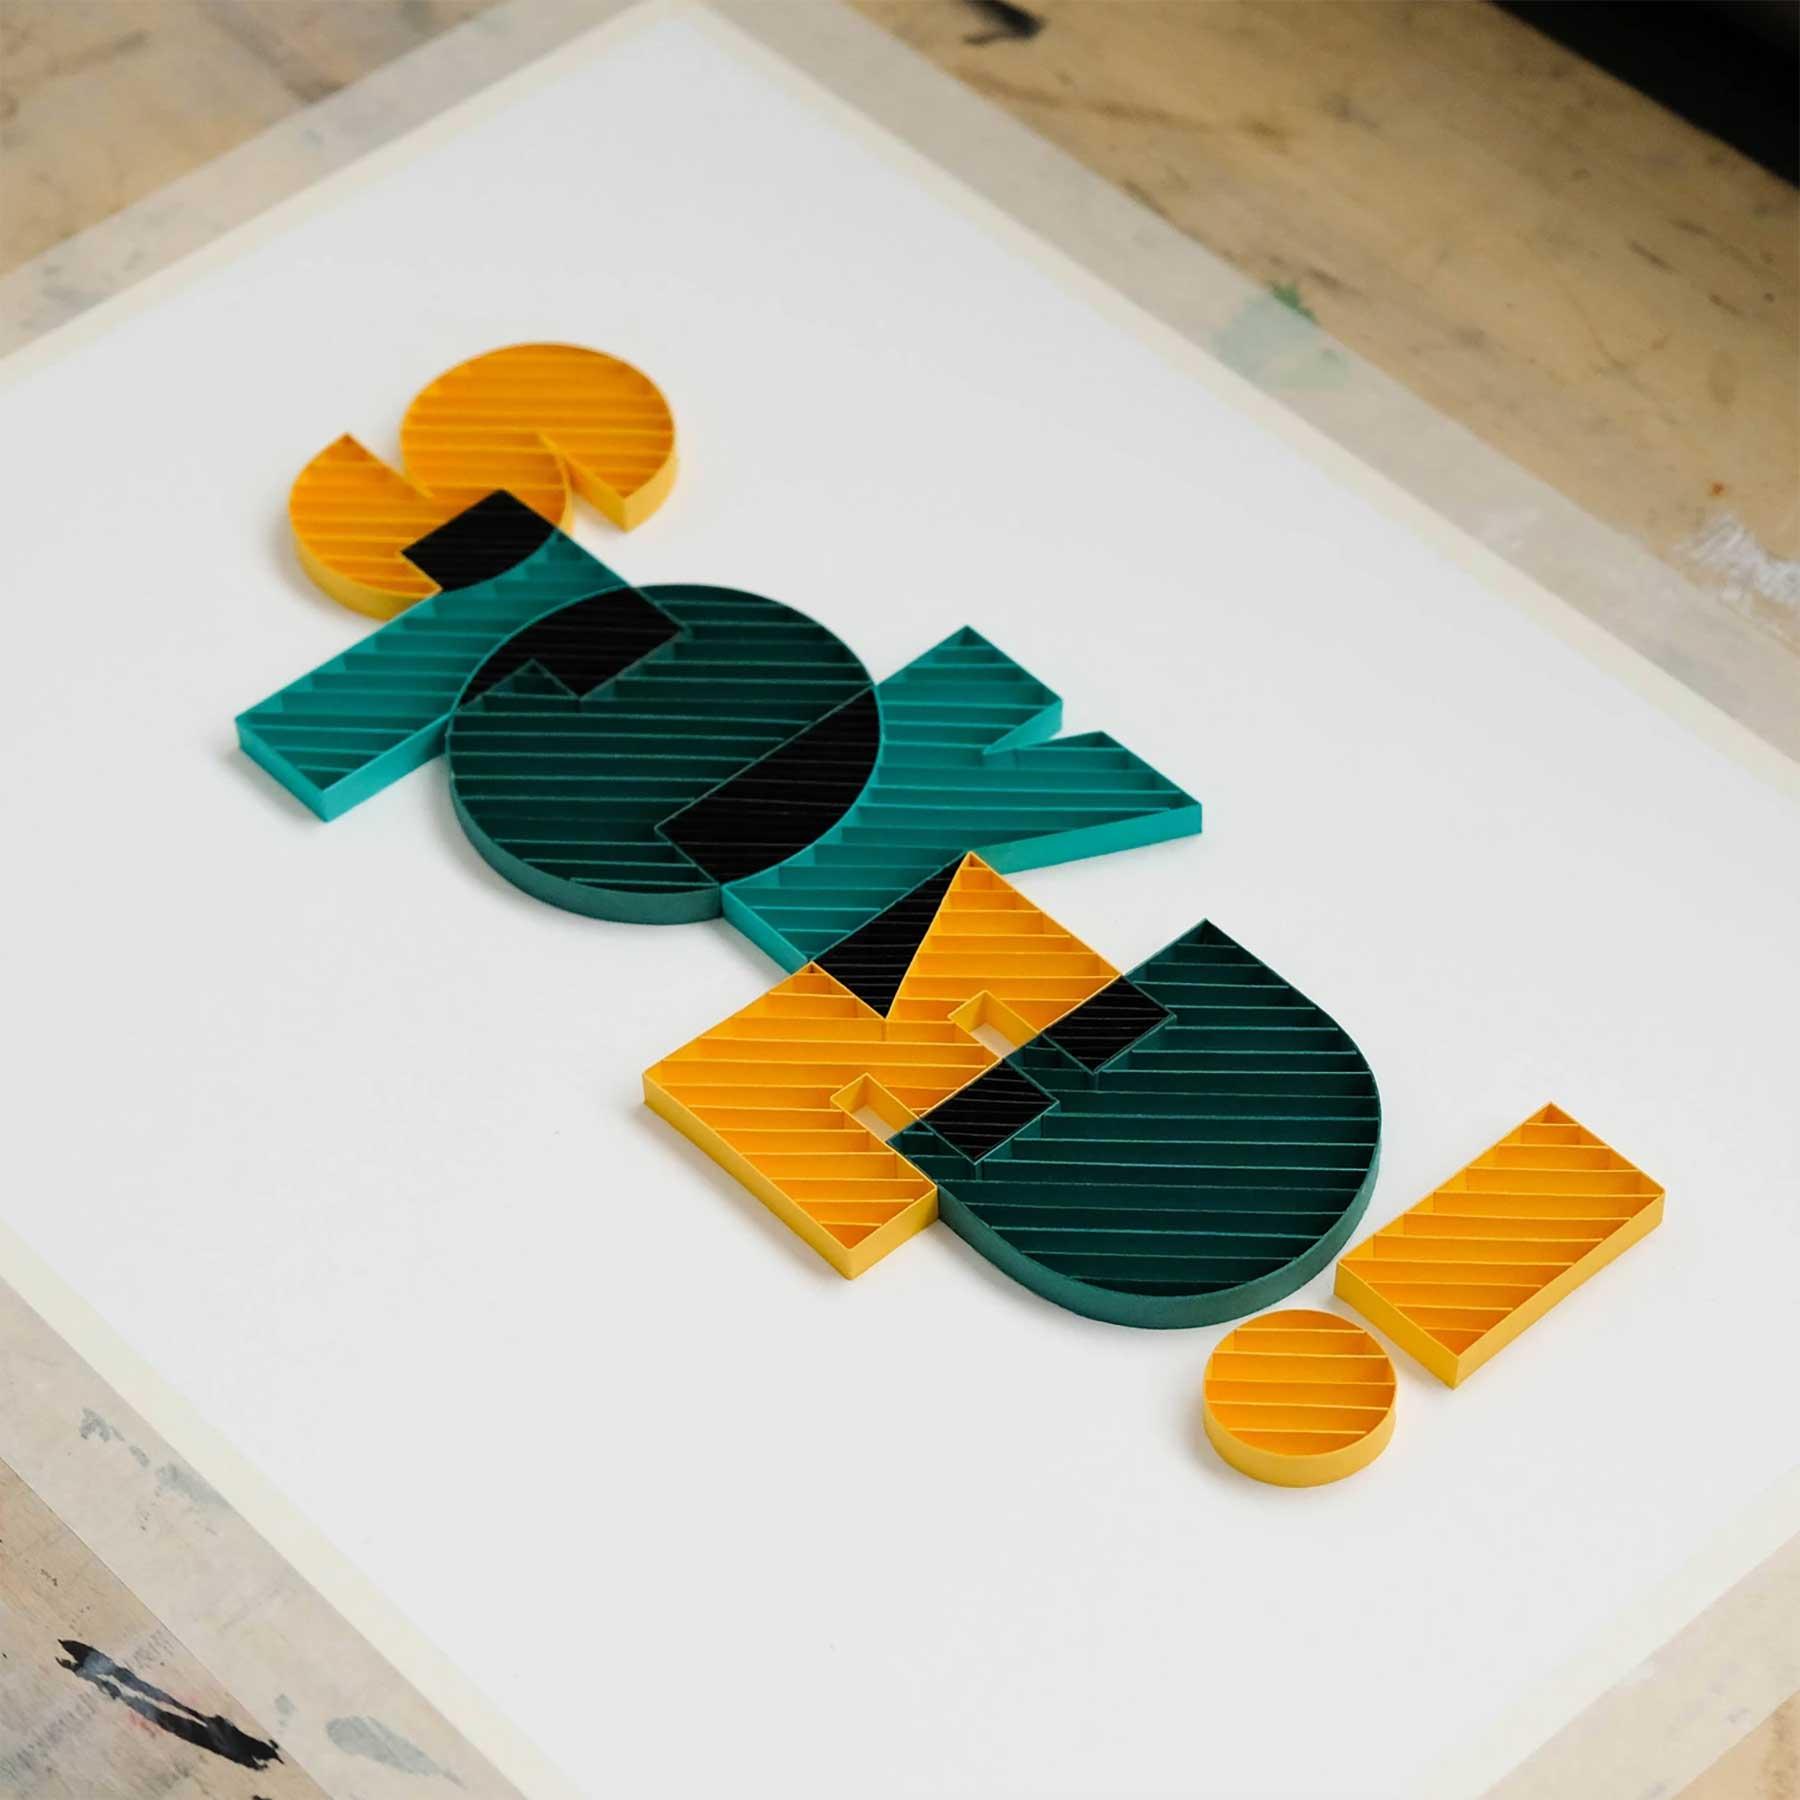 3D-Papier-Lettering von Alia Bright Alia-Bright-paperlettering_11